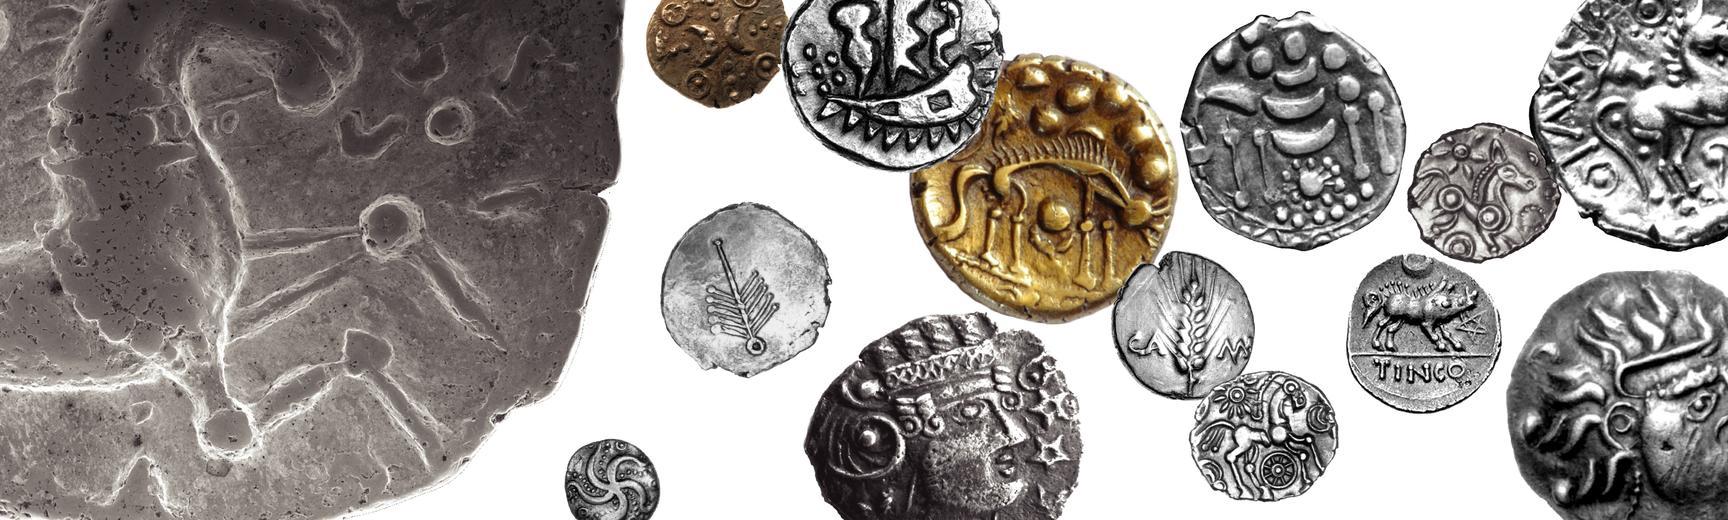 British Iron Age Coins